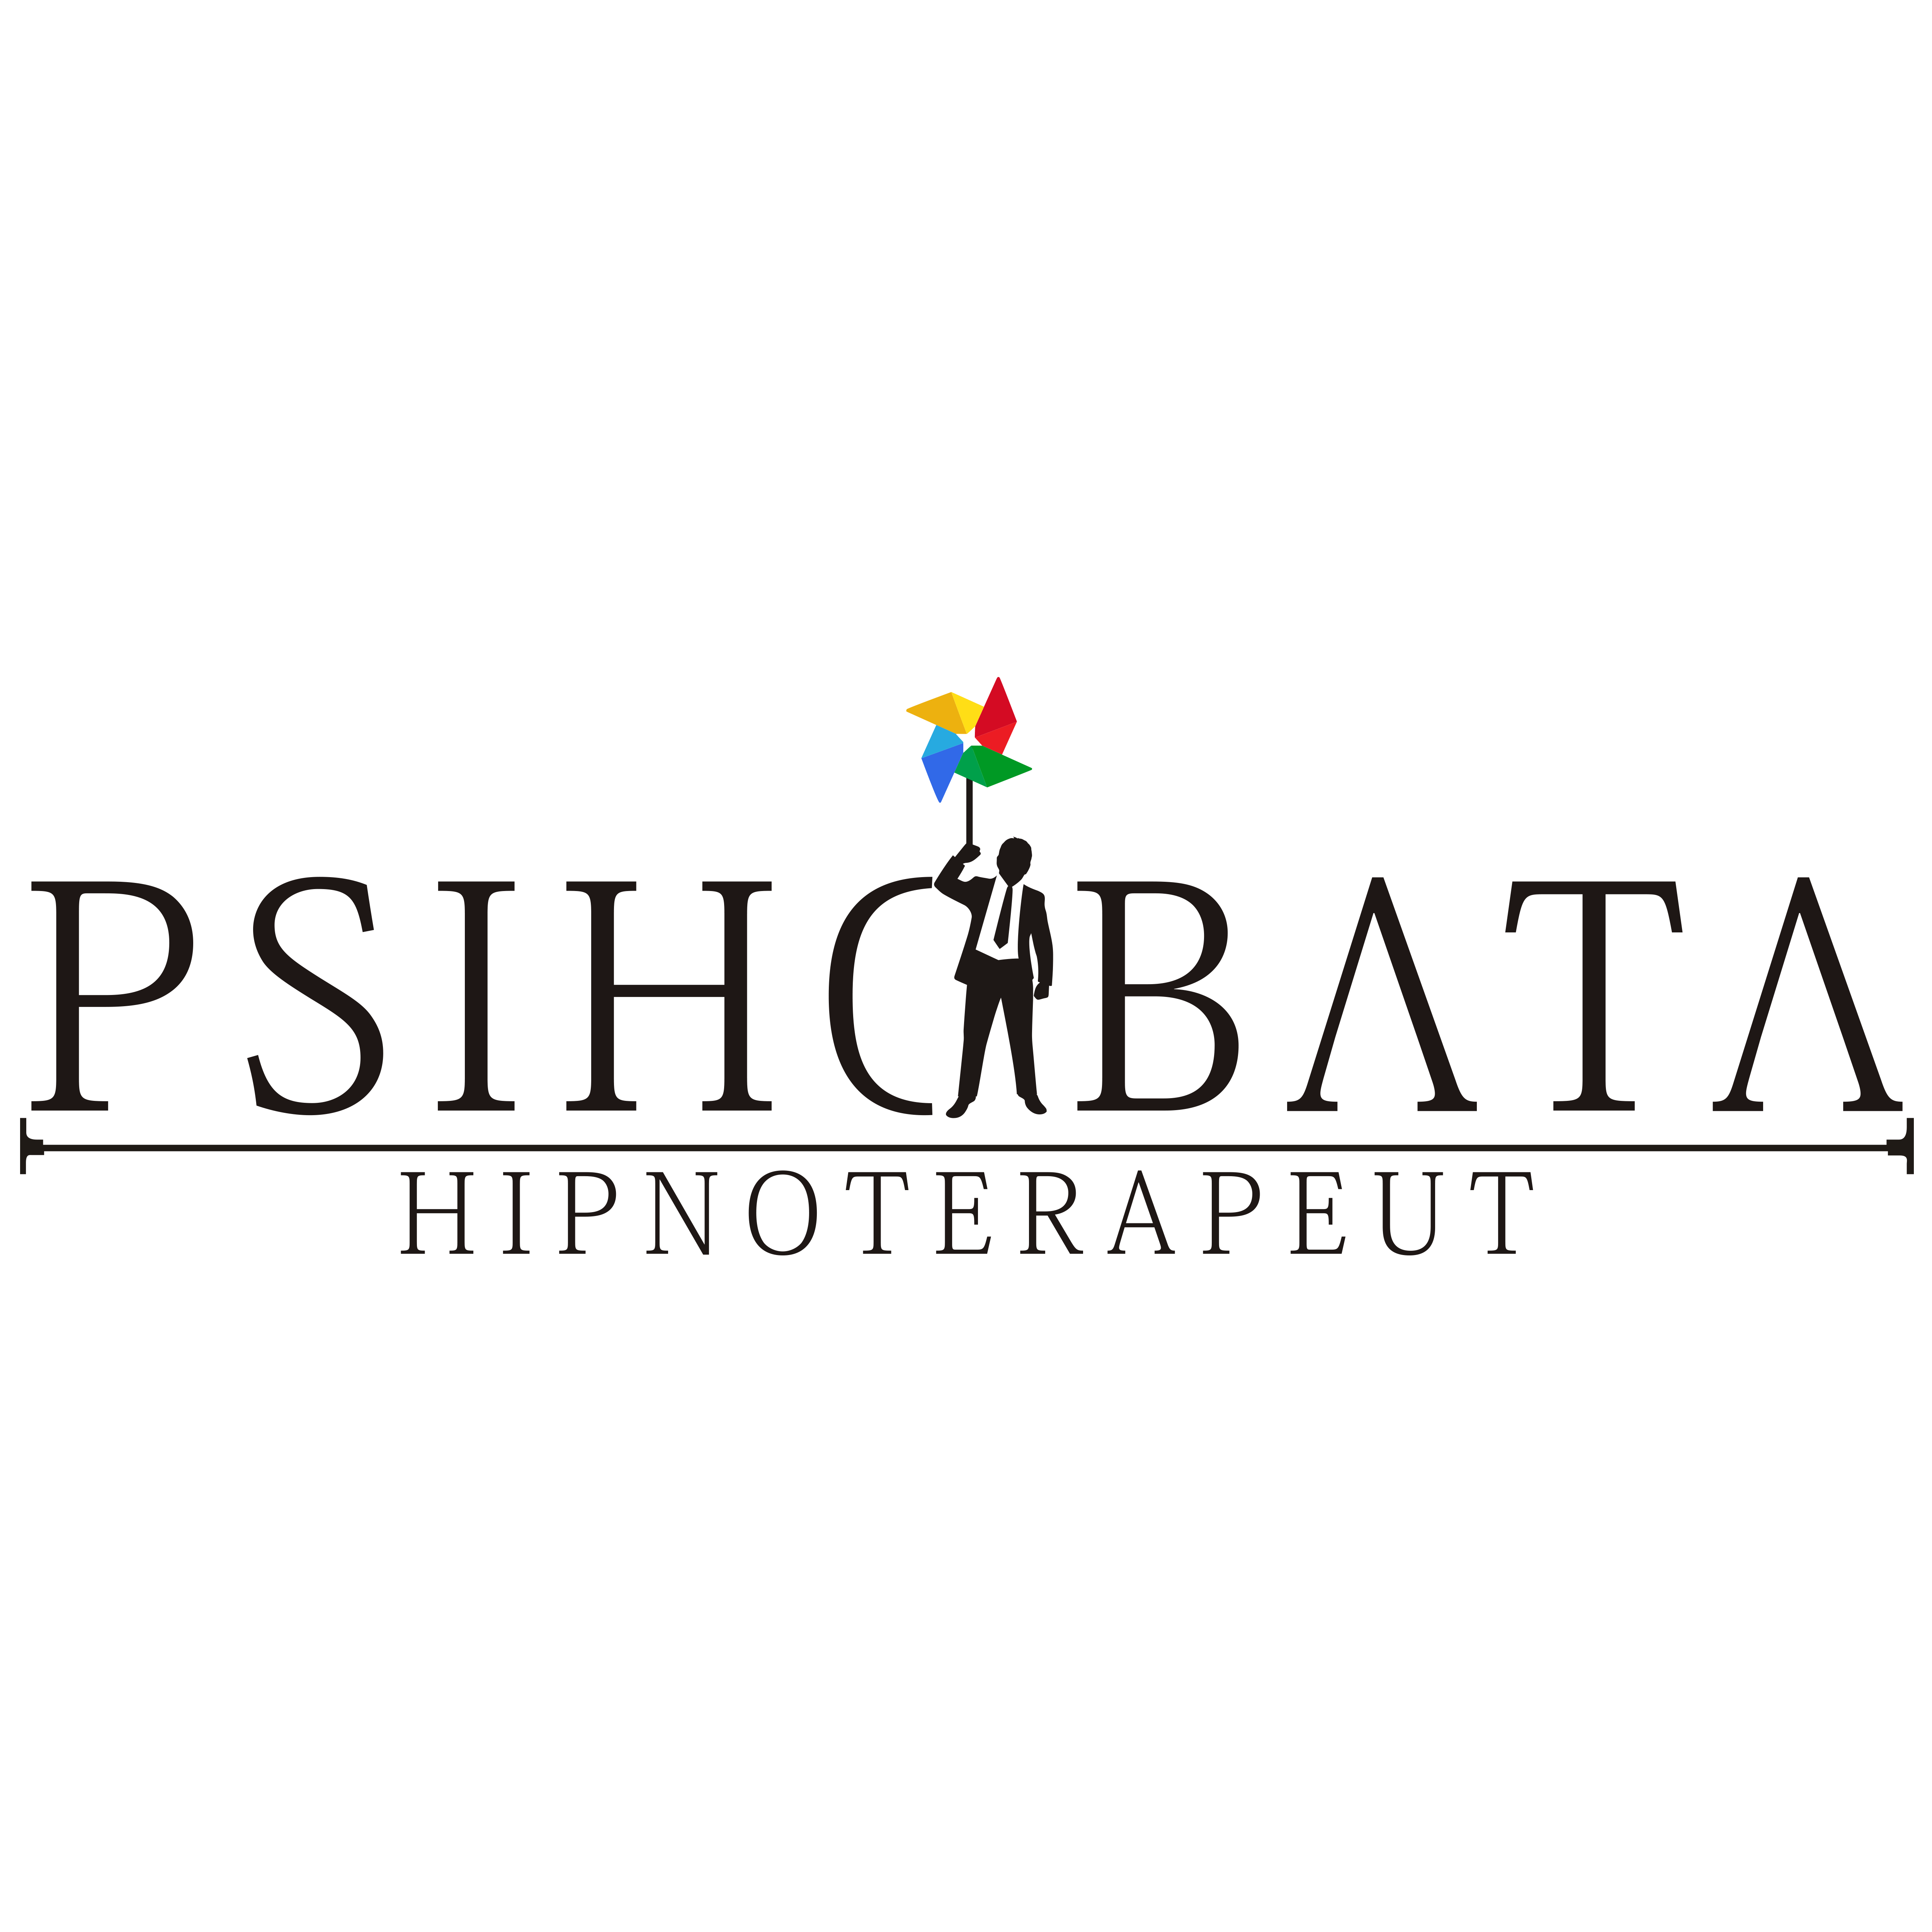 Logo PsihoBata